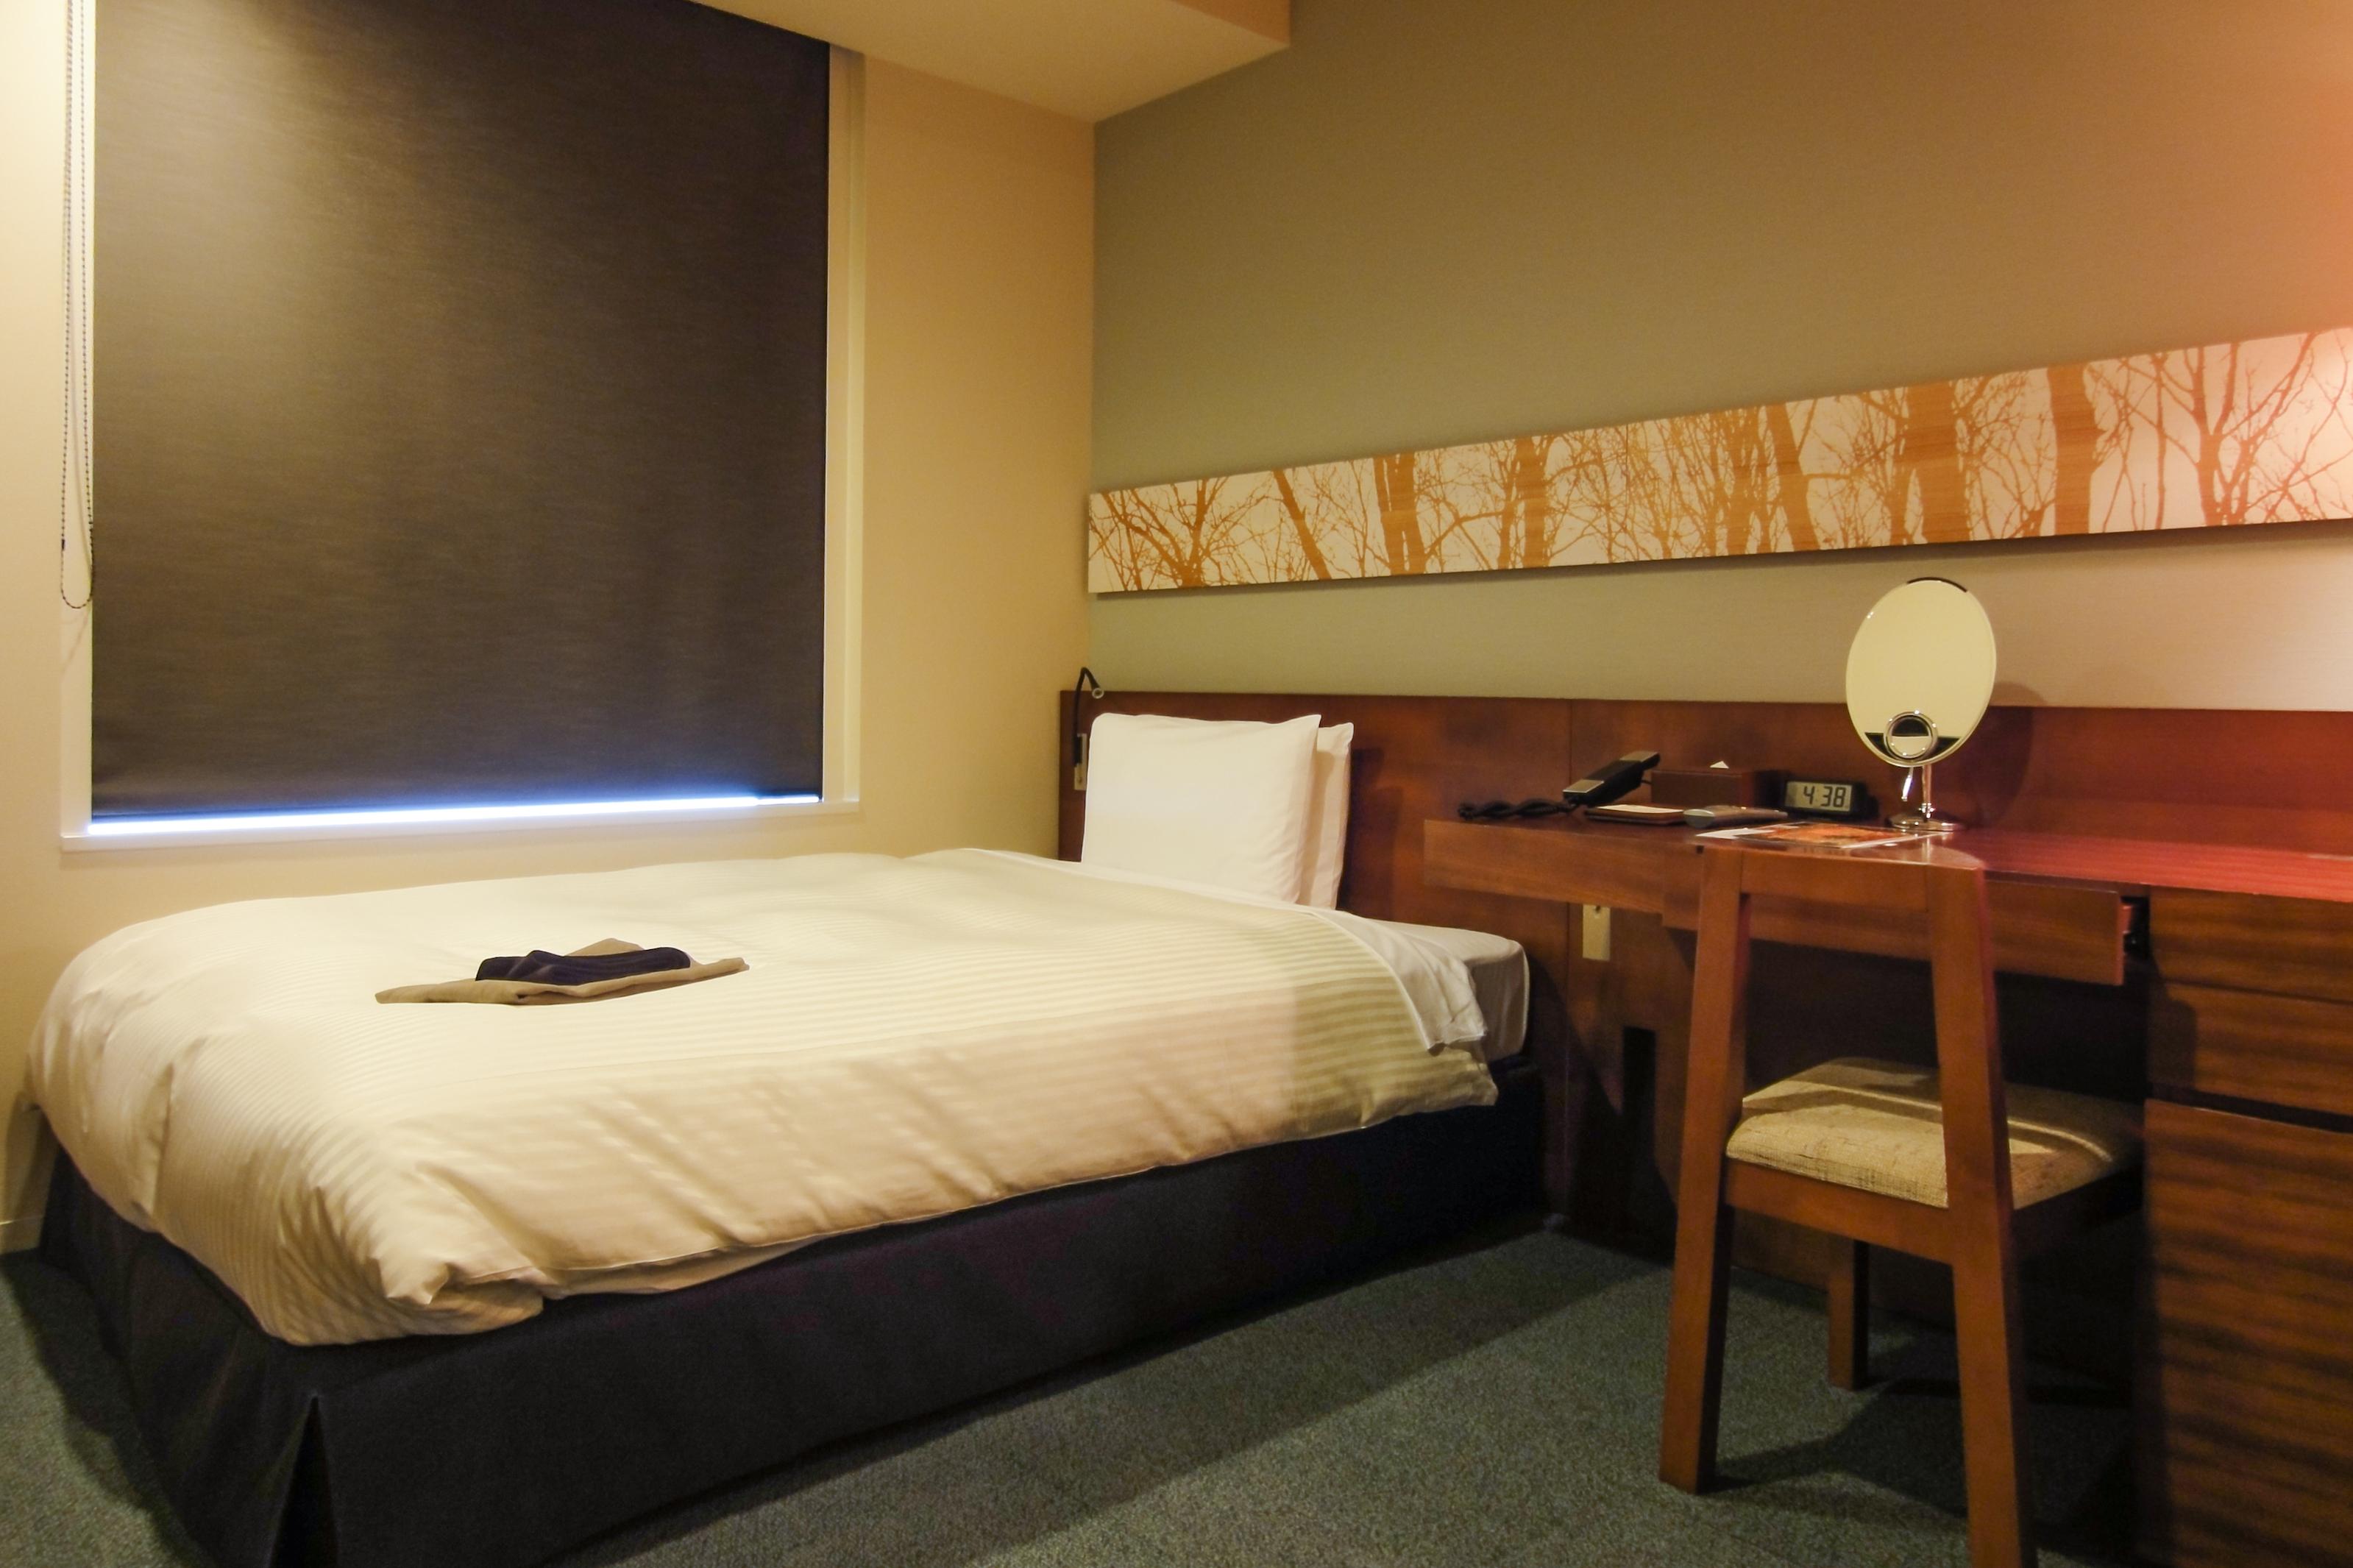 Mitsui_Garden_Hotel_Sendai_Standard_Single_B_bedroom_20100809-001